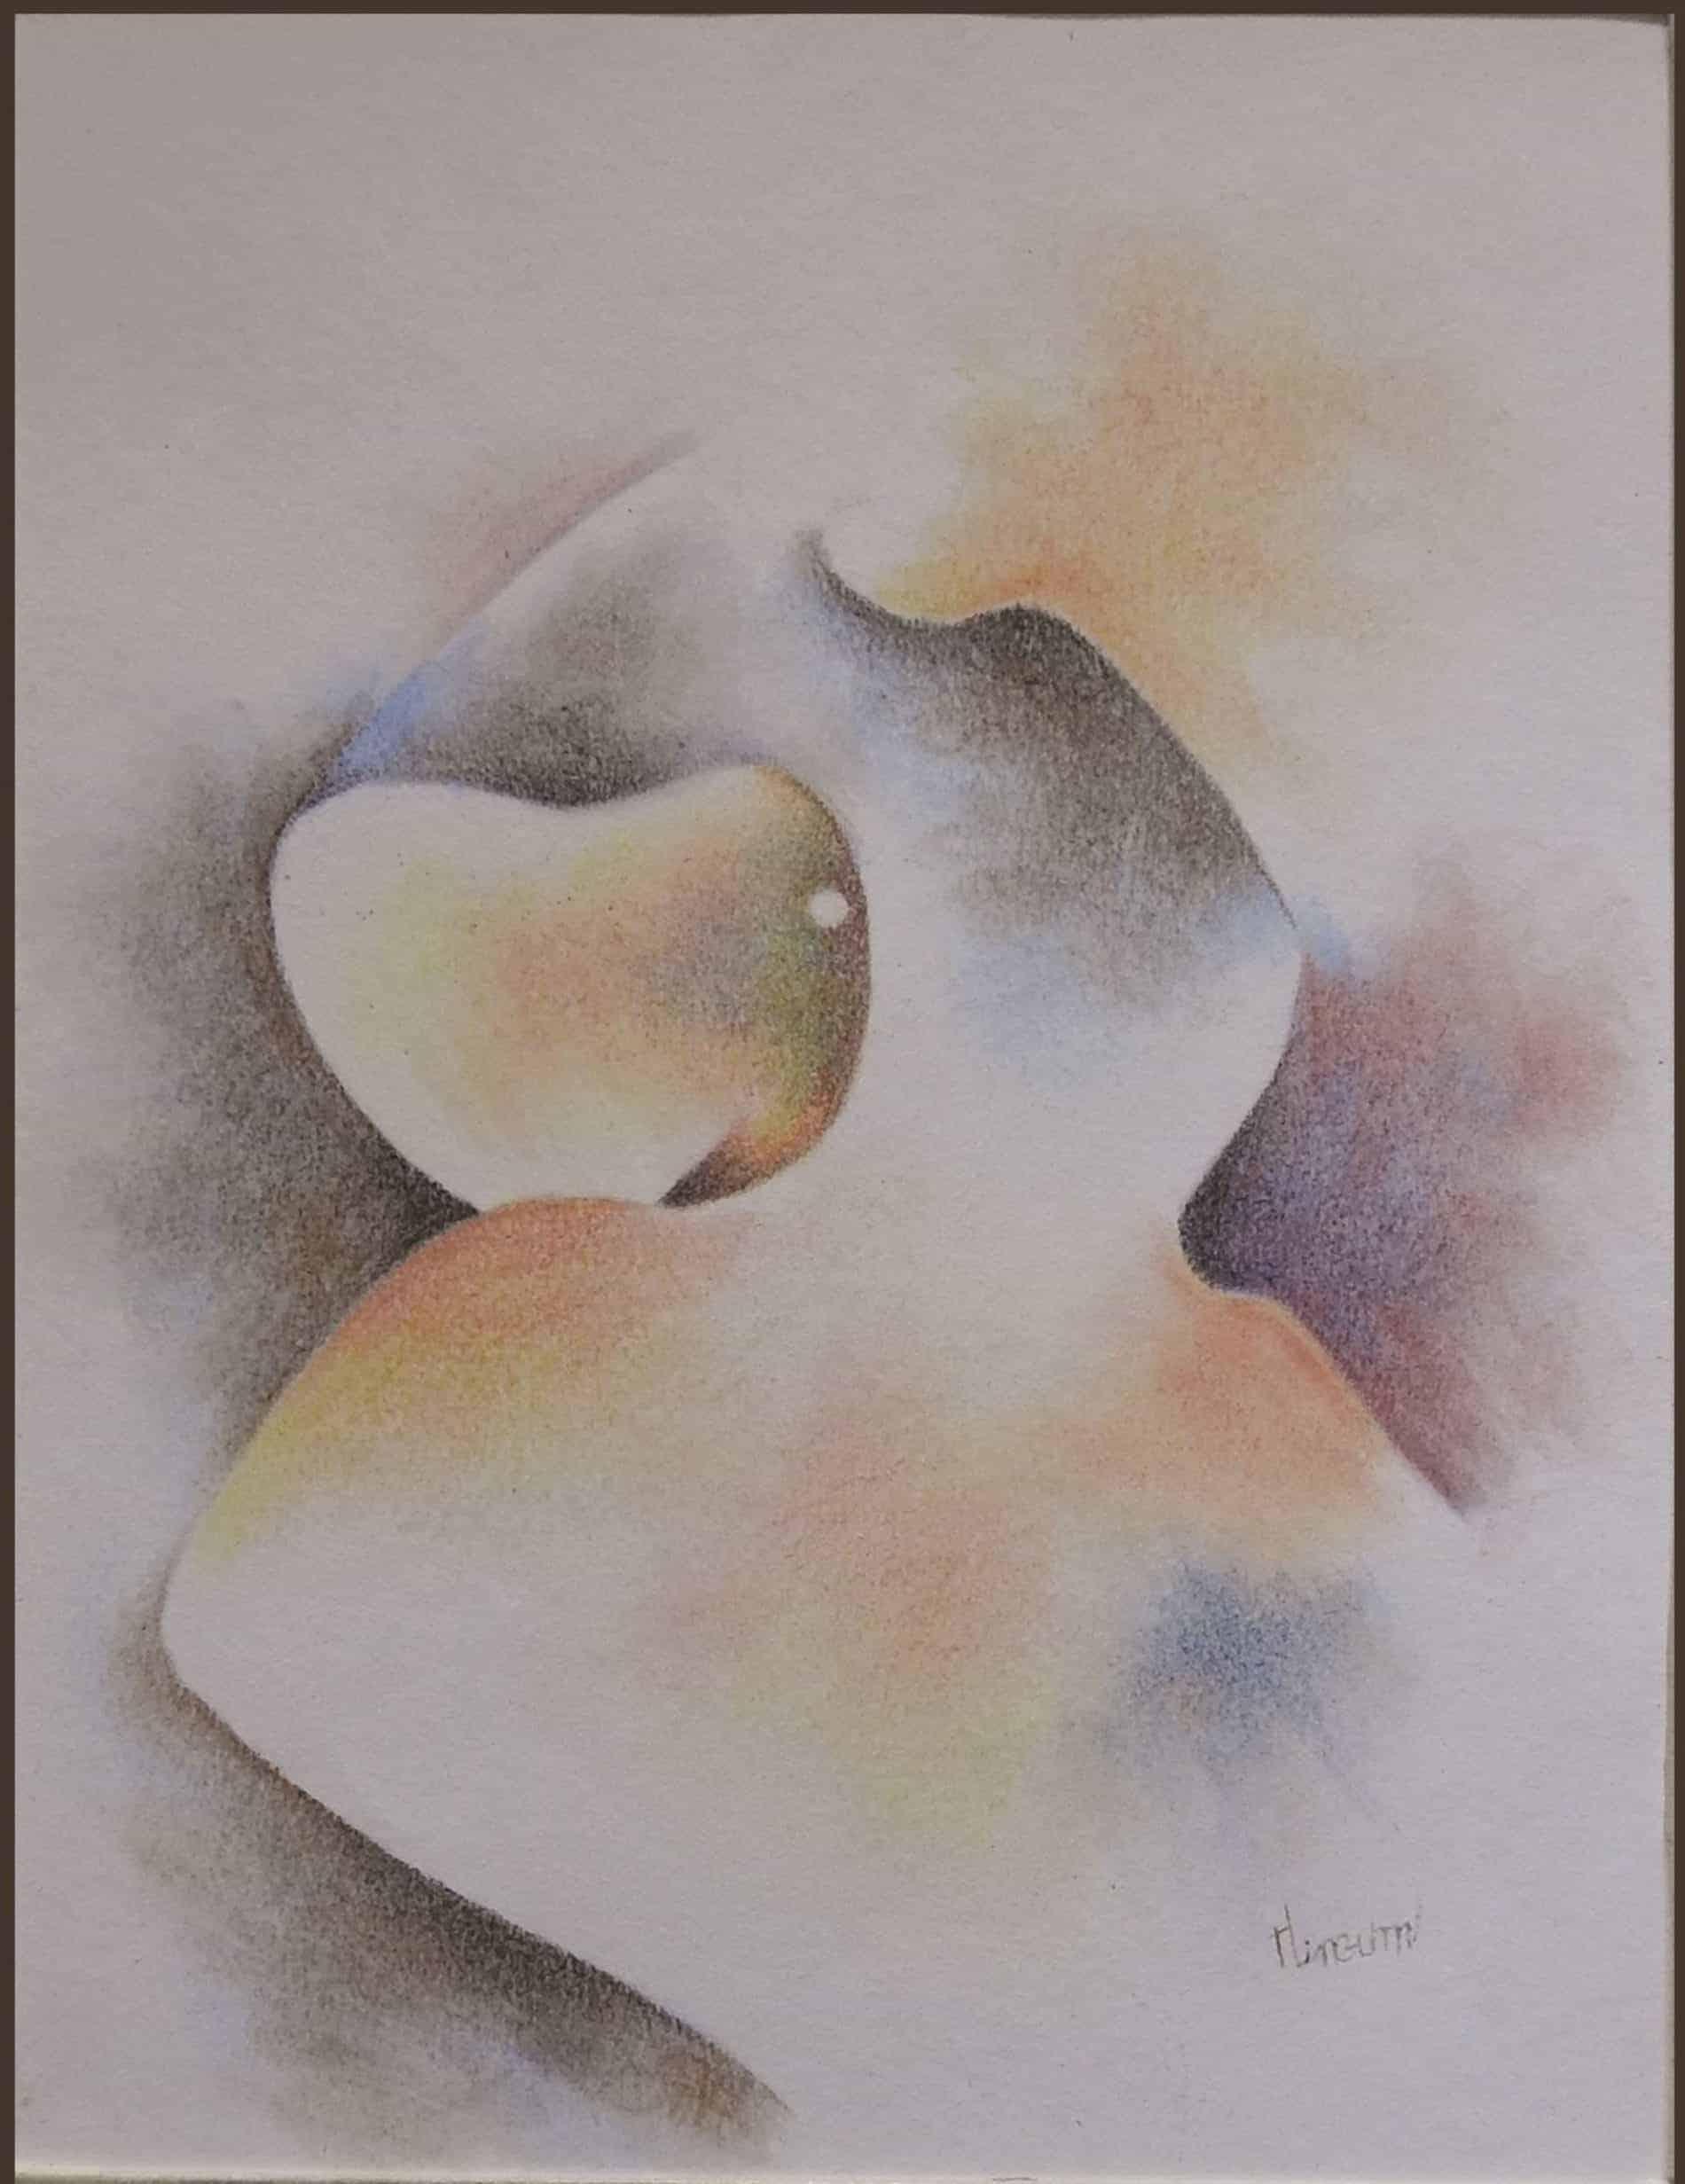 Mauritius Arts & Artists - moorthy-nagalingum-joy